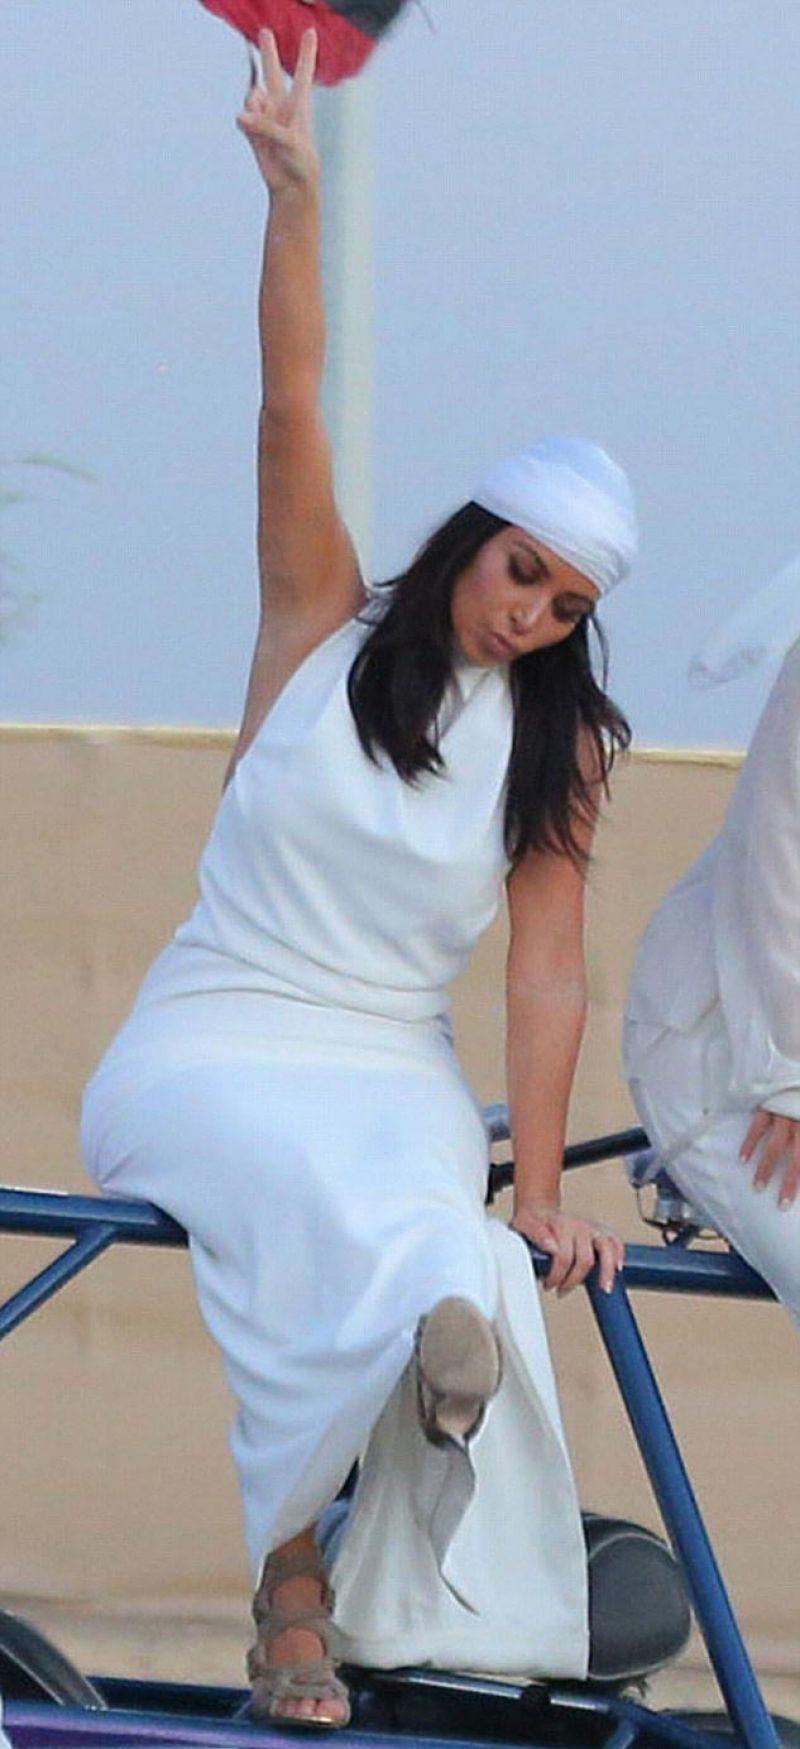 Kim Kardashian - Riding Around the Dubai Desert on Dune Buggies - November 2014